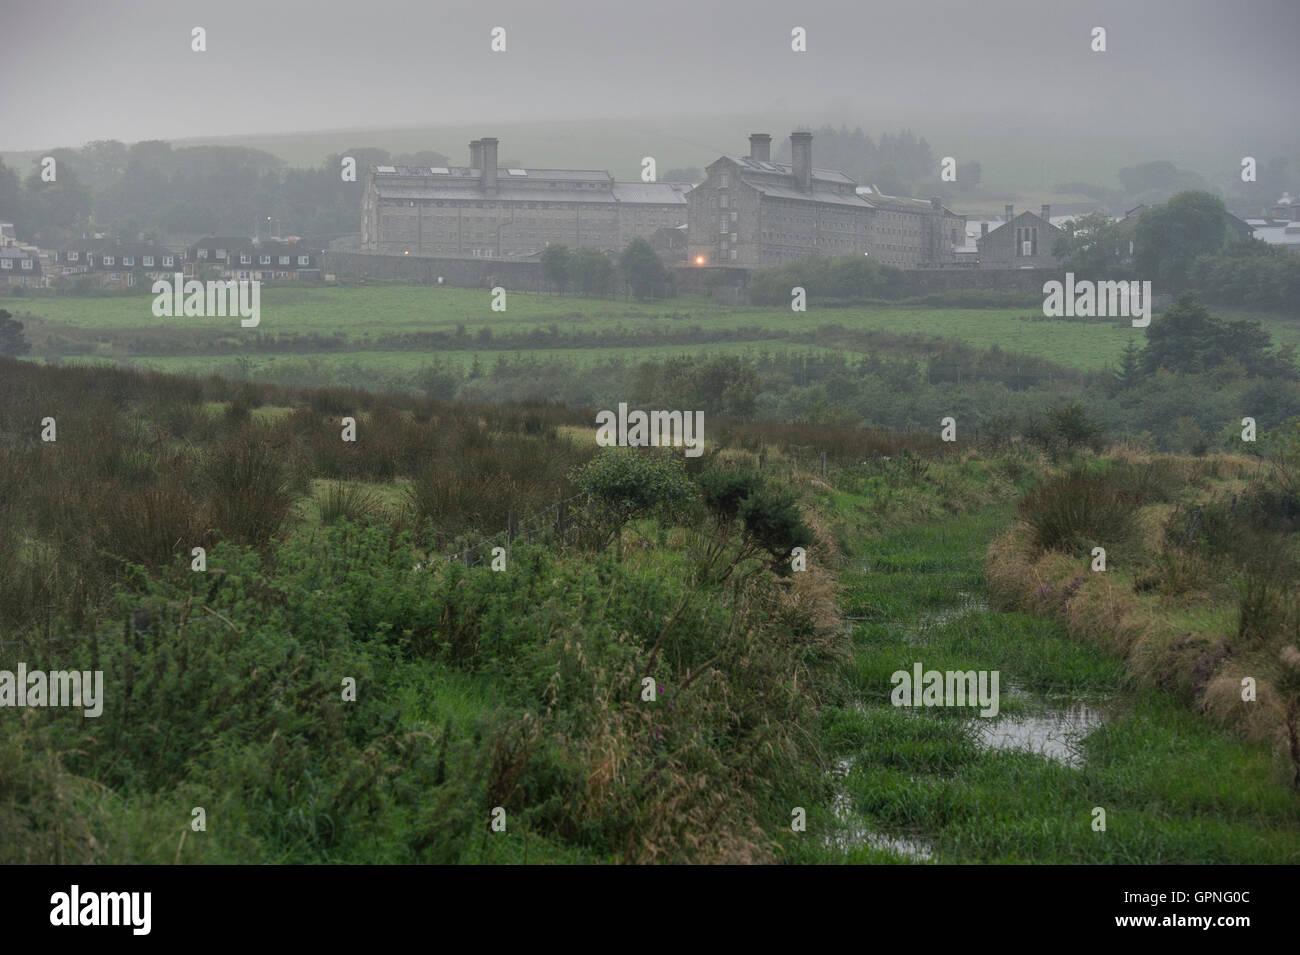 Hm Prisons Stock Photos & Hm Prisons Stock Images - Alamy